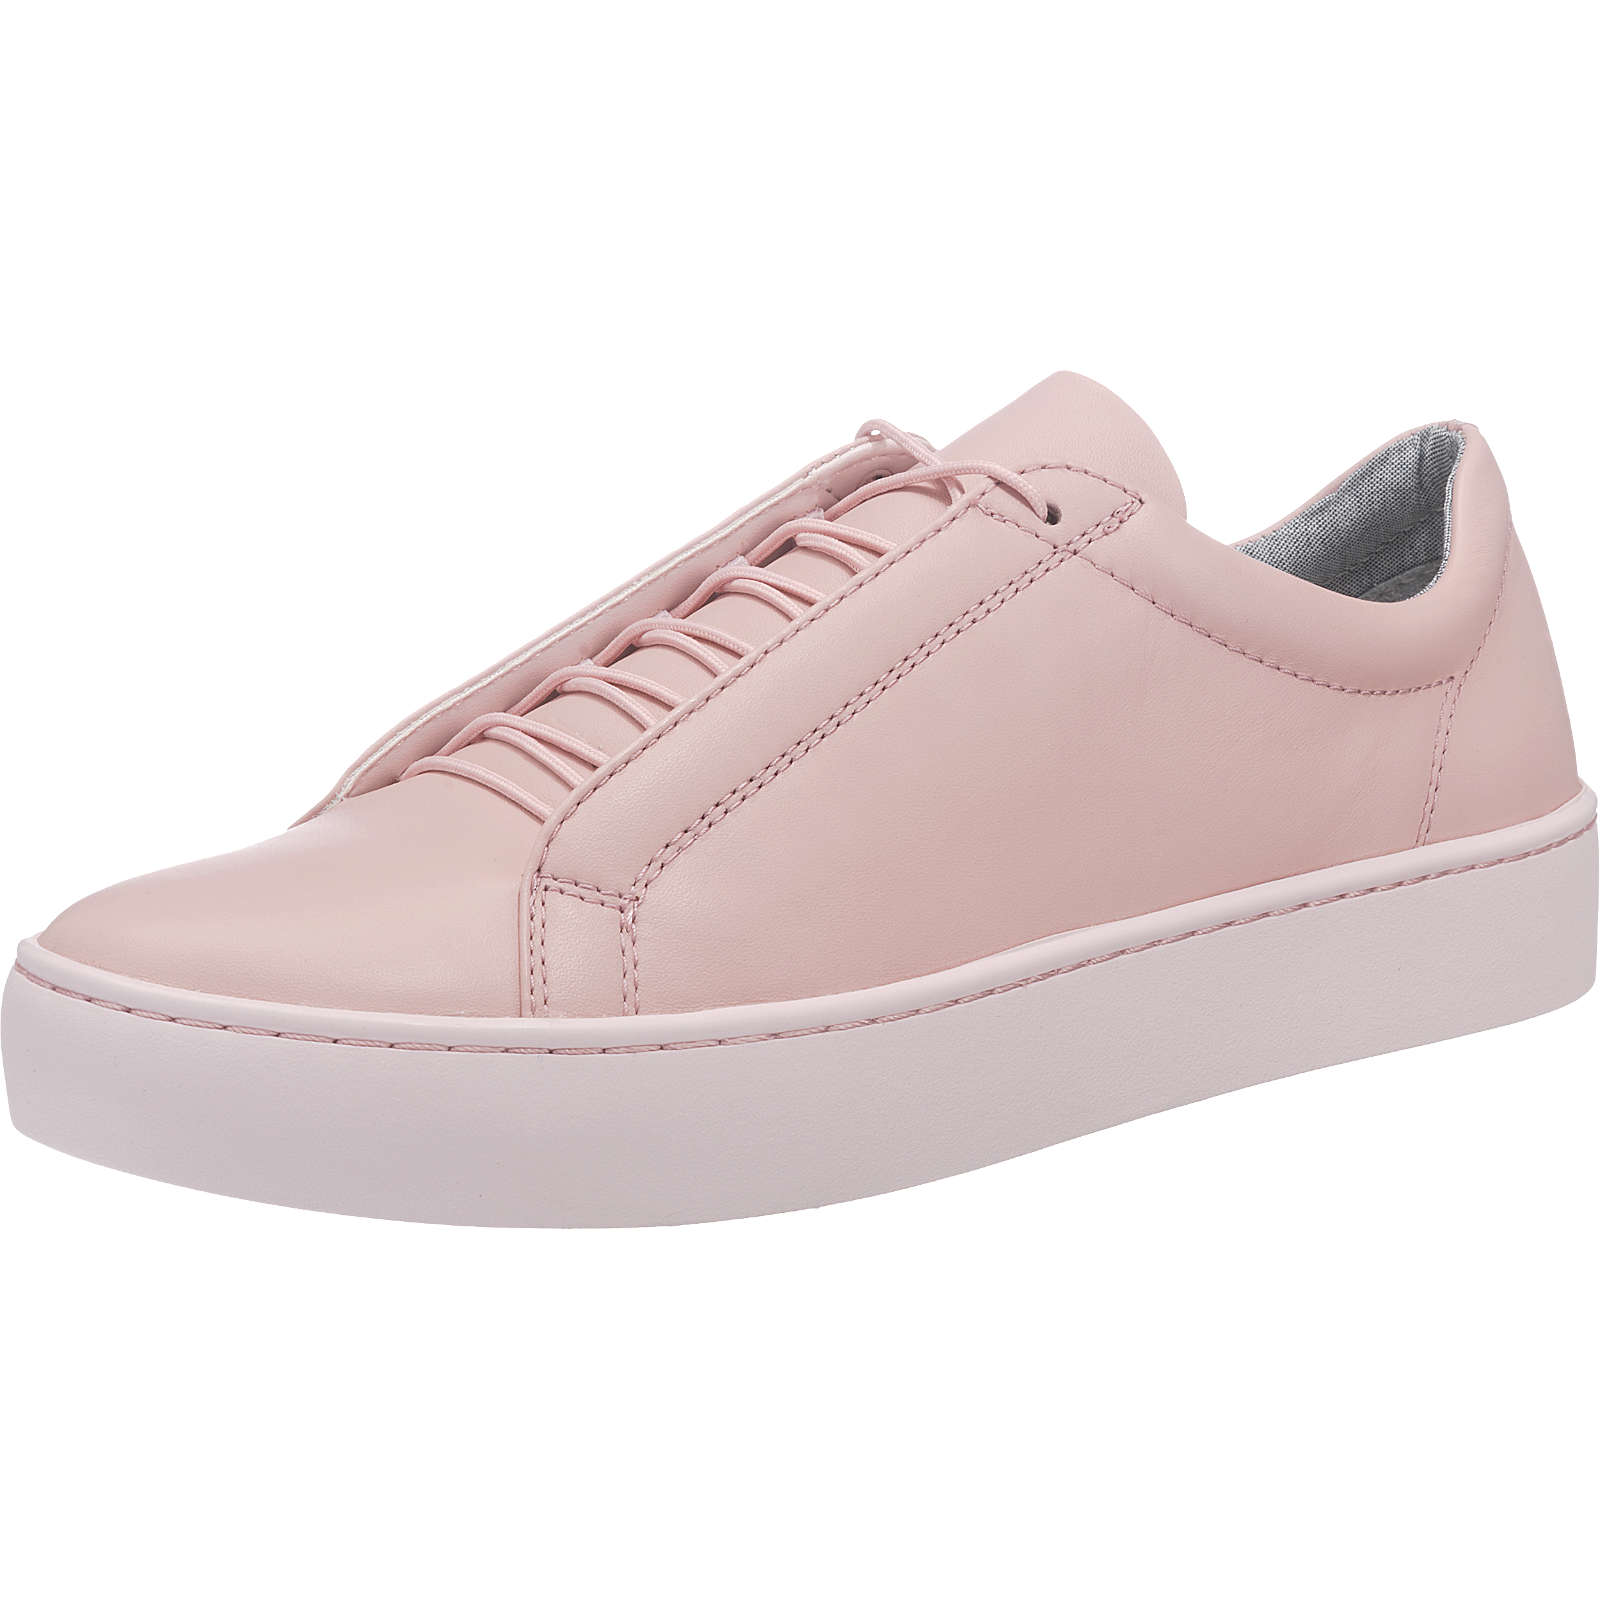 VAGABOND ZOE Sneakers rosa Damen Gr. 38